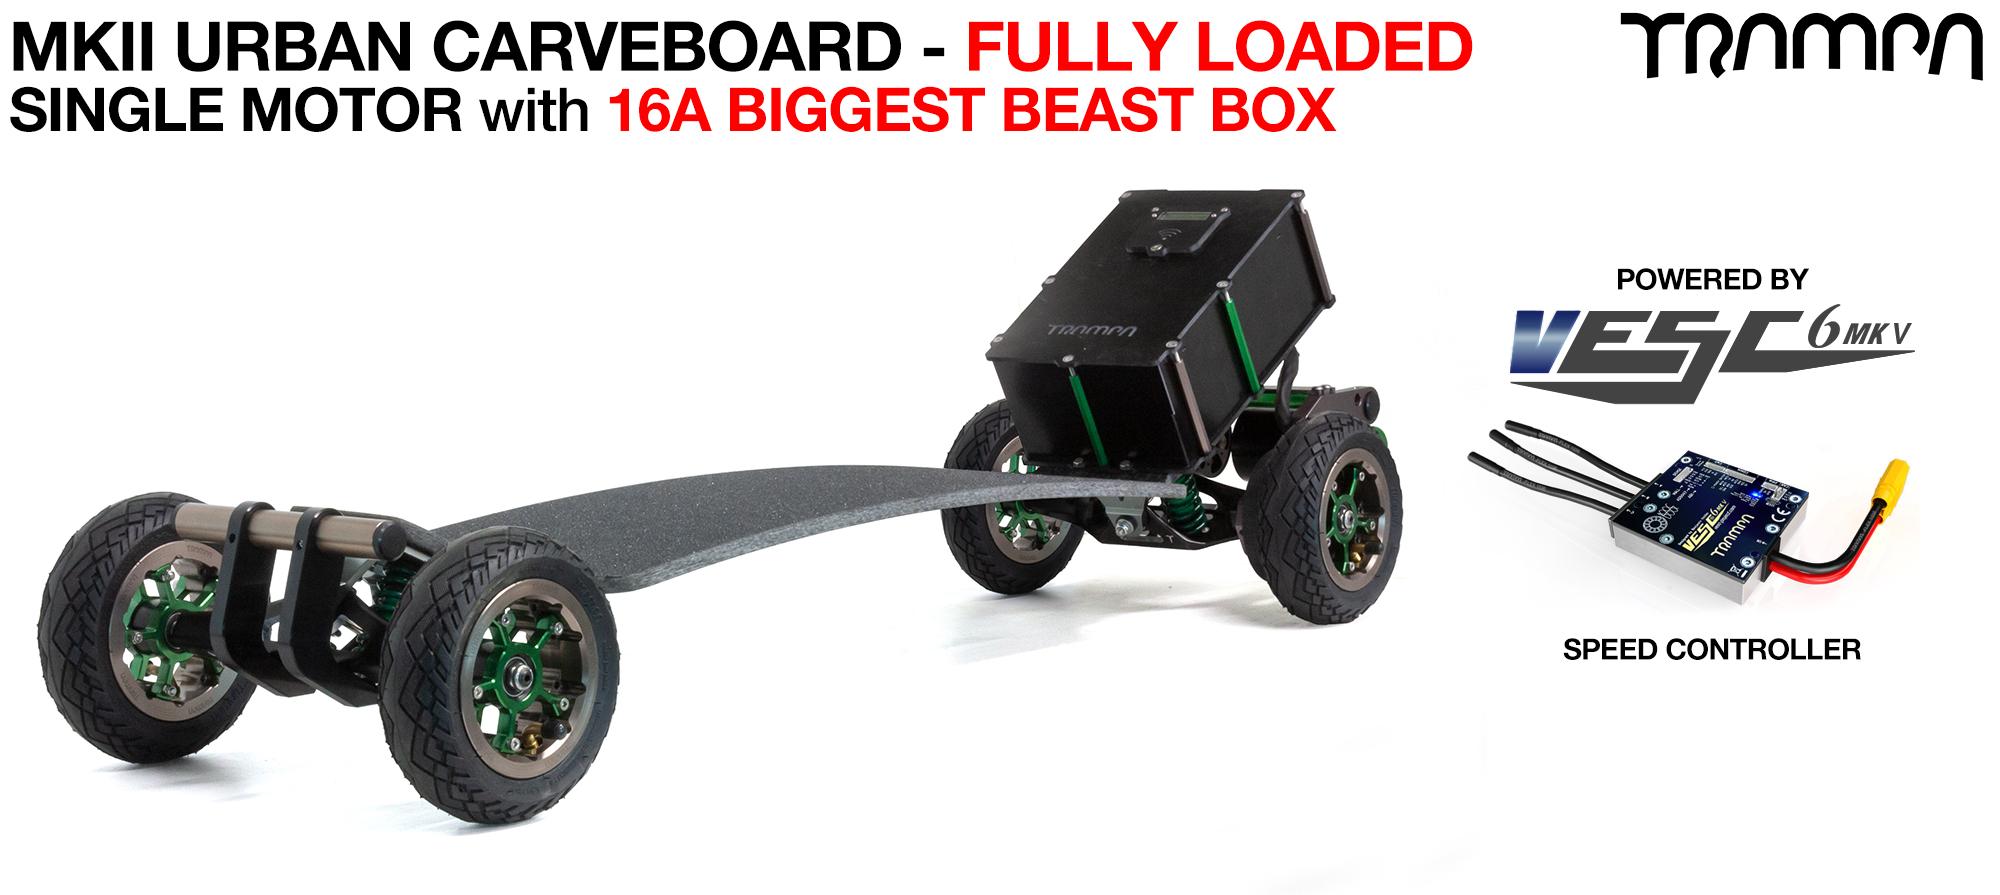 TRAMPA's MkIII Electric URBAN Carveboard - uses Mini Spring Trucks with MkIII Carve board Motor Mount,s Custom TRAMPA hubs & 125mm URBAN longboard Tyres - SINGLE Motor 16A FULLY LOADED MEGASTAR